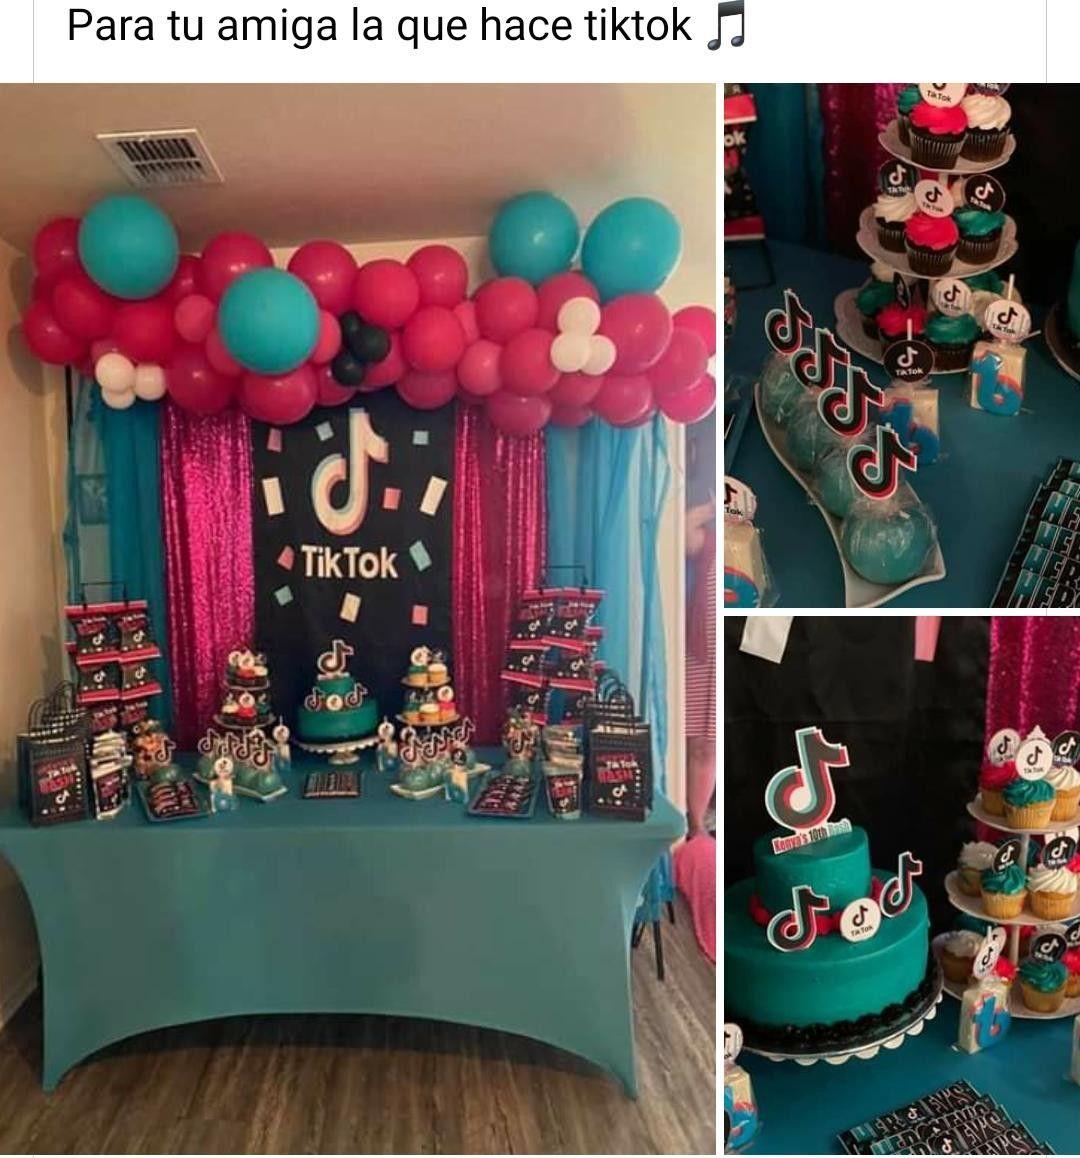 Pin By M Trinidad On Tiktok In 2020 Birthday Surprise Party Kids Themed Birthday Kids Themed Birthday Parties Birthday Surprise Party Dance Party Birthday